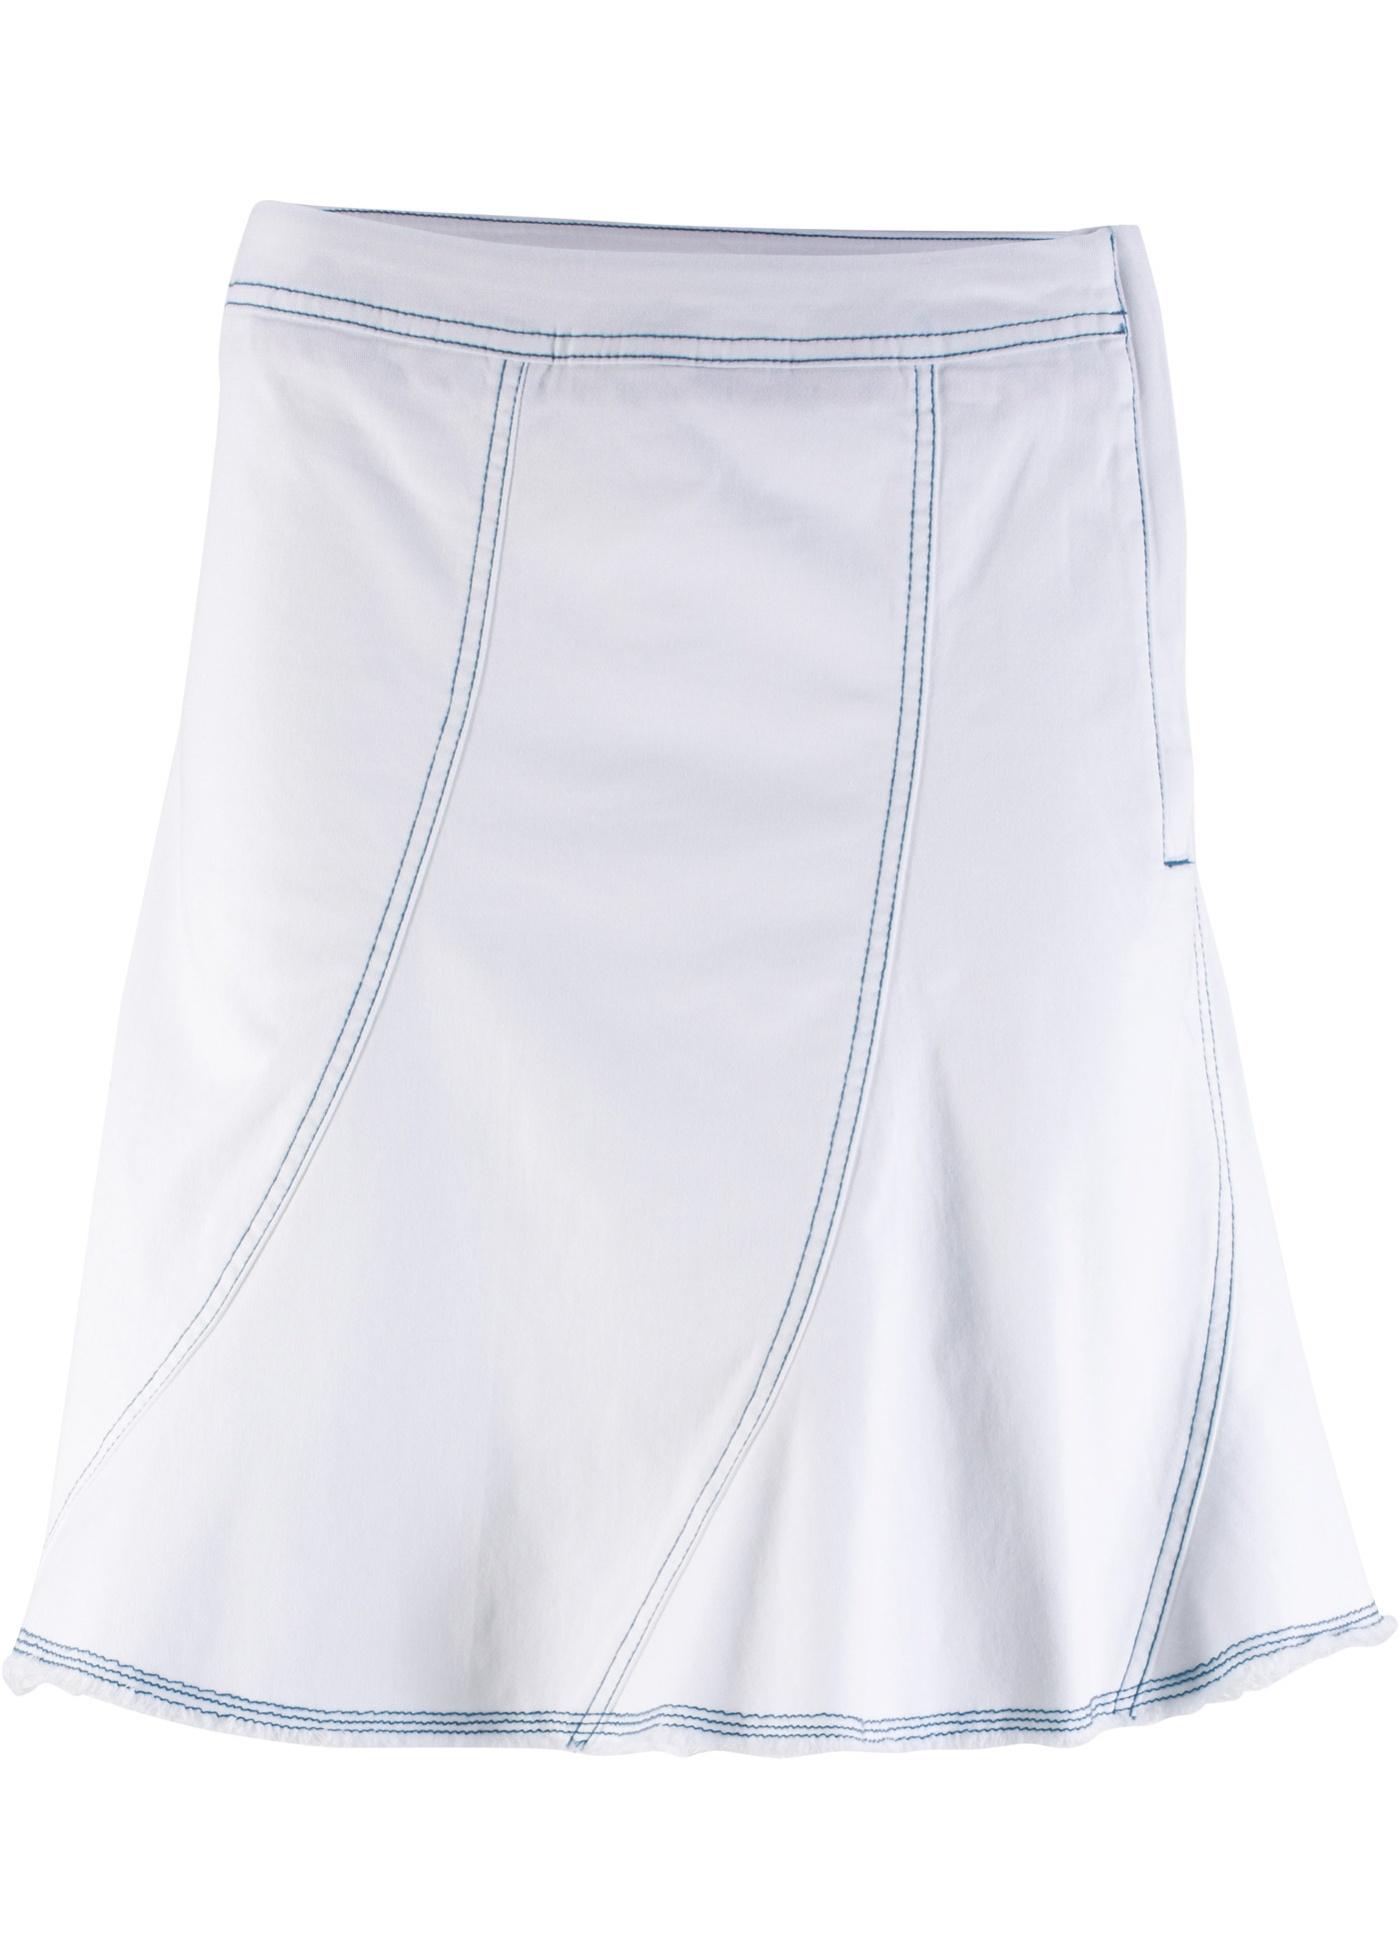 Jean BonprixJupe Extensible Blanc Femme John Baner Jeanswear En Pour QrdsthC